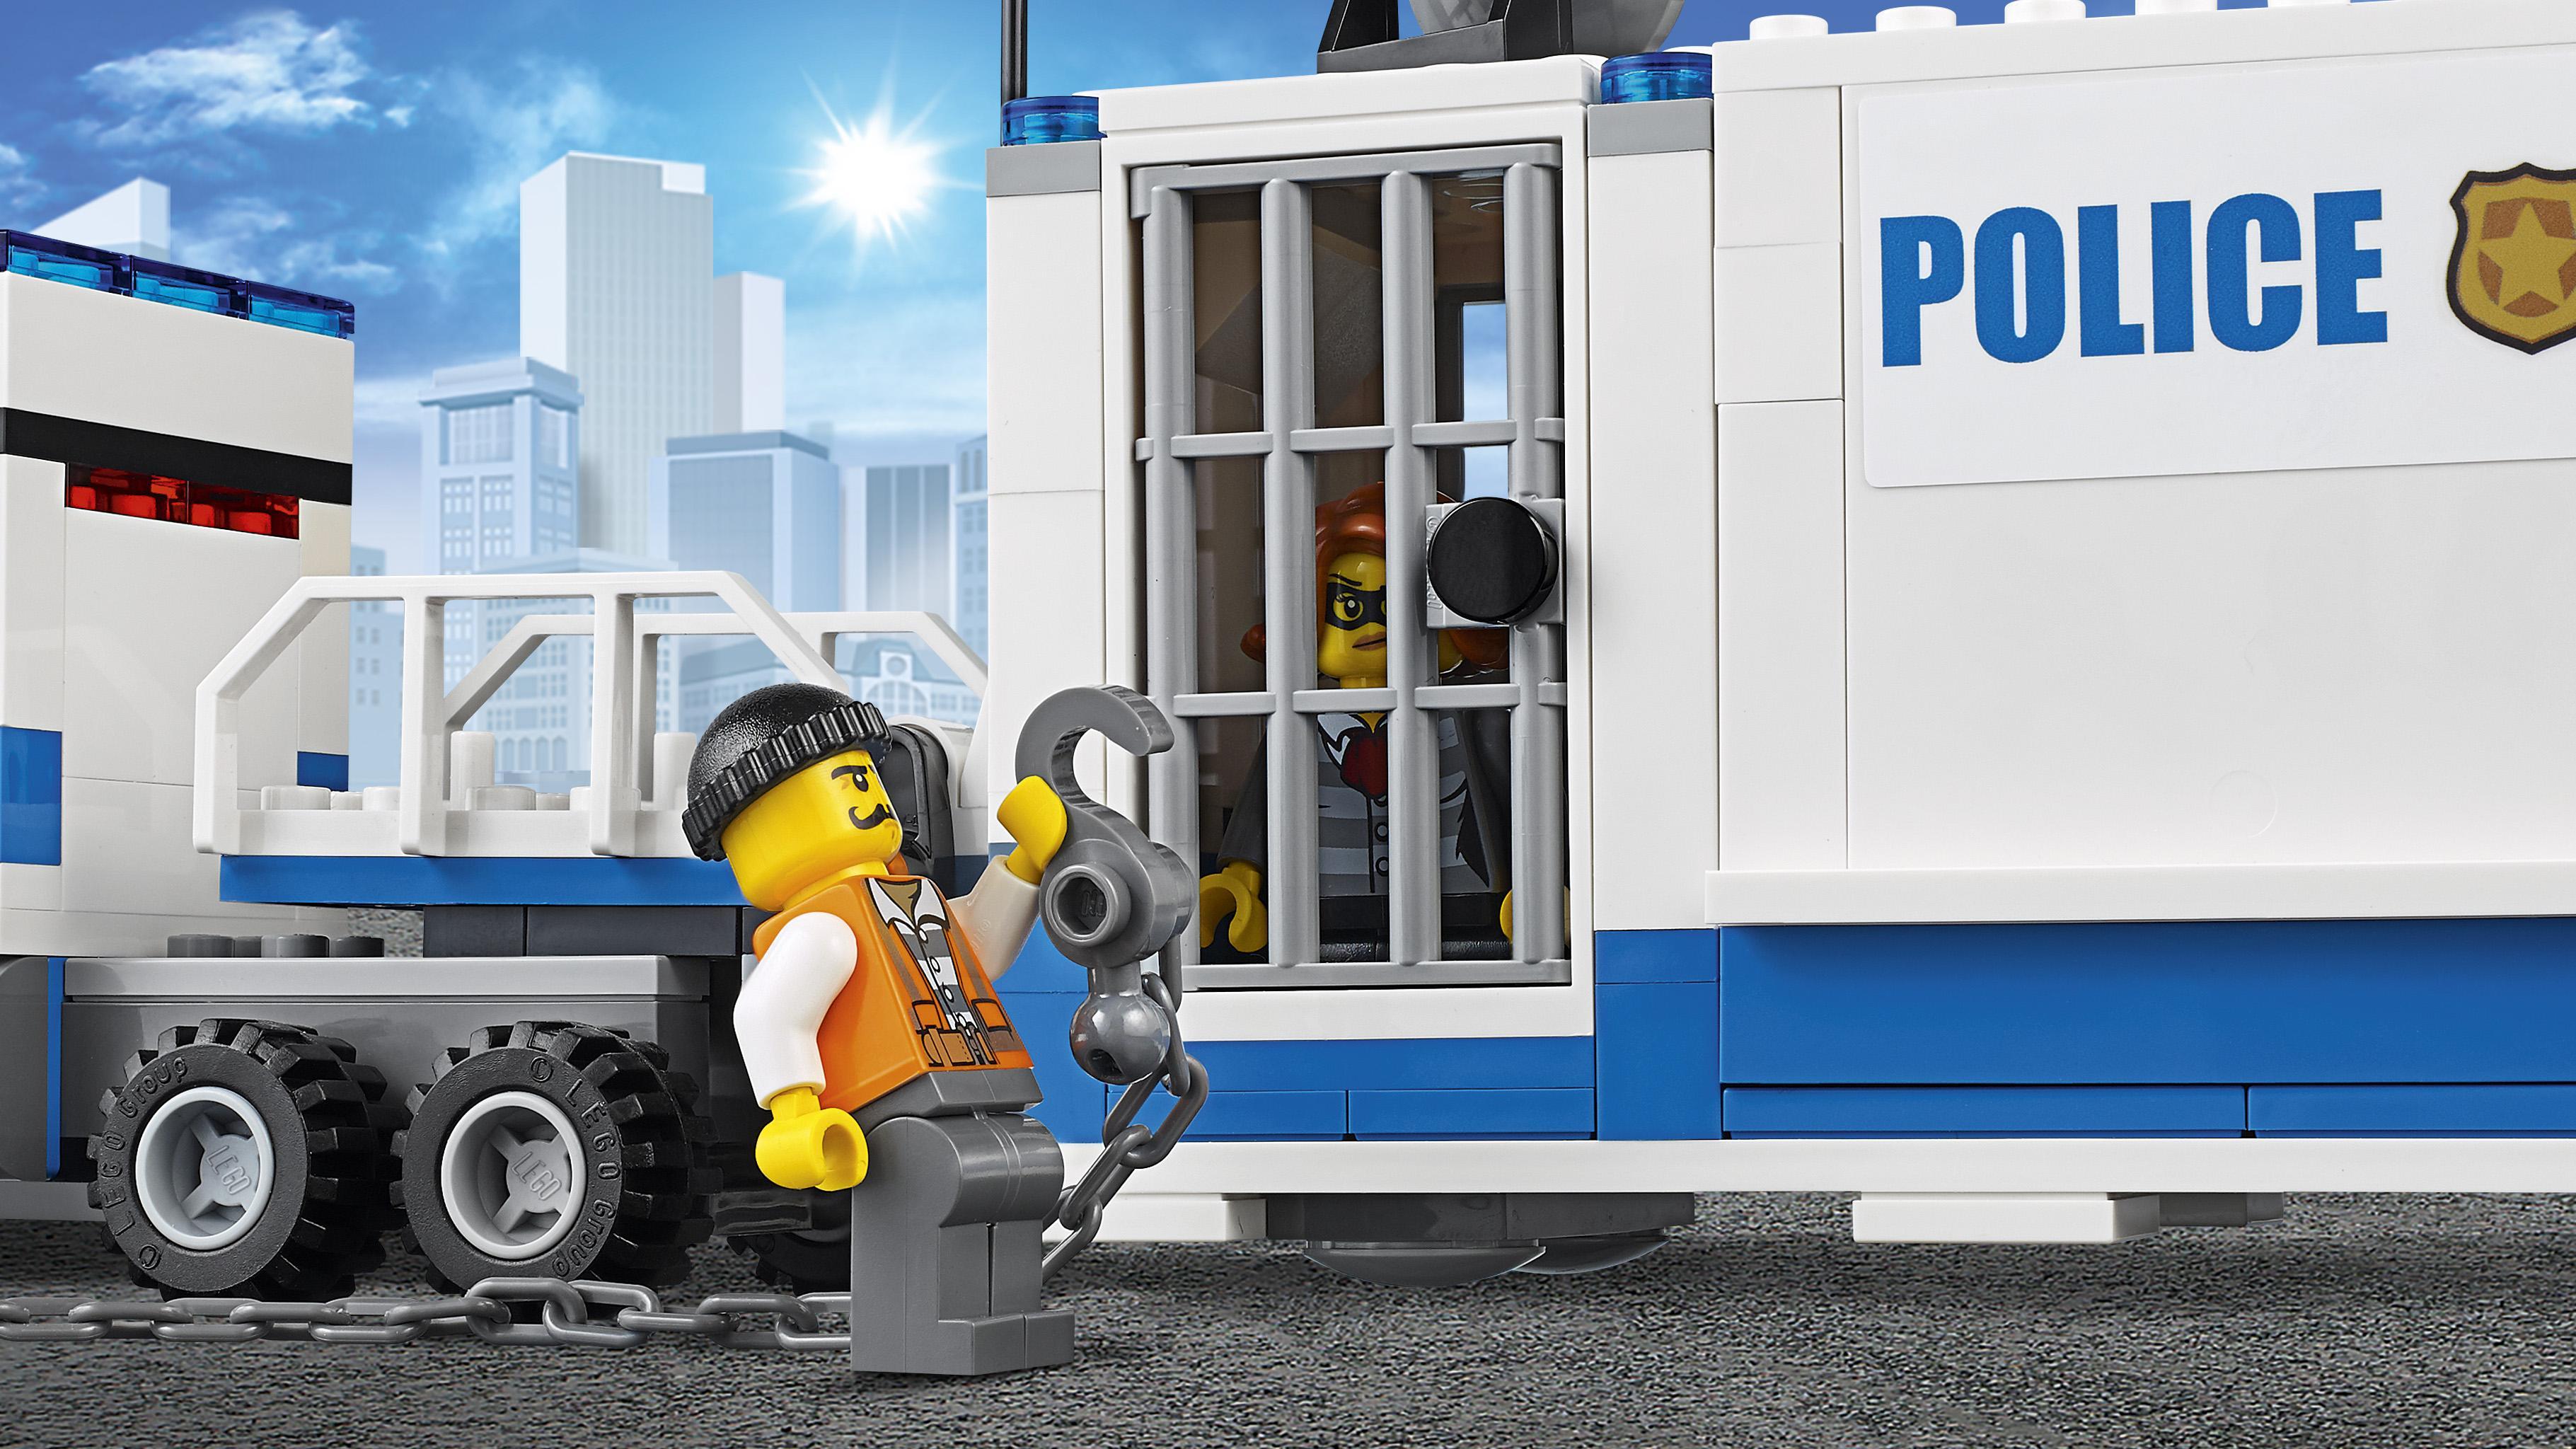 Lego 60139 Quot Mobile Command Center Quot Building Toy Lego